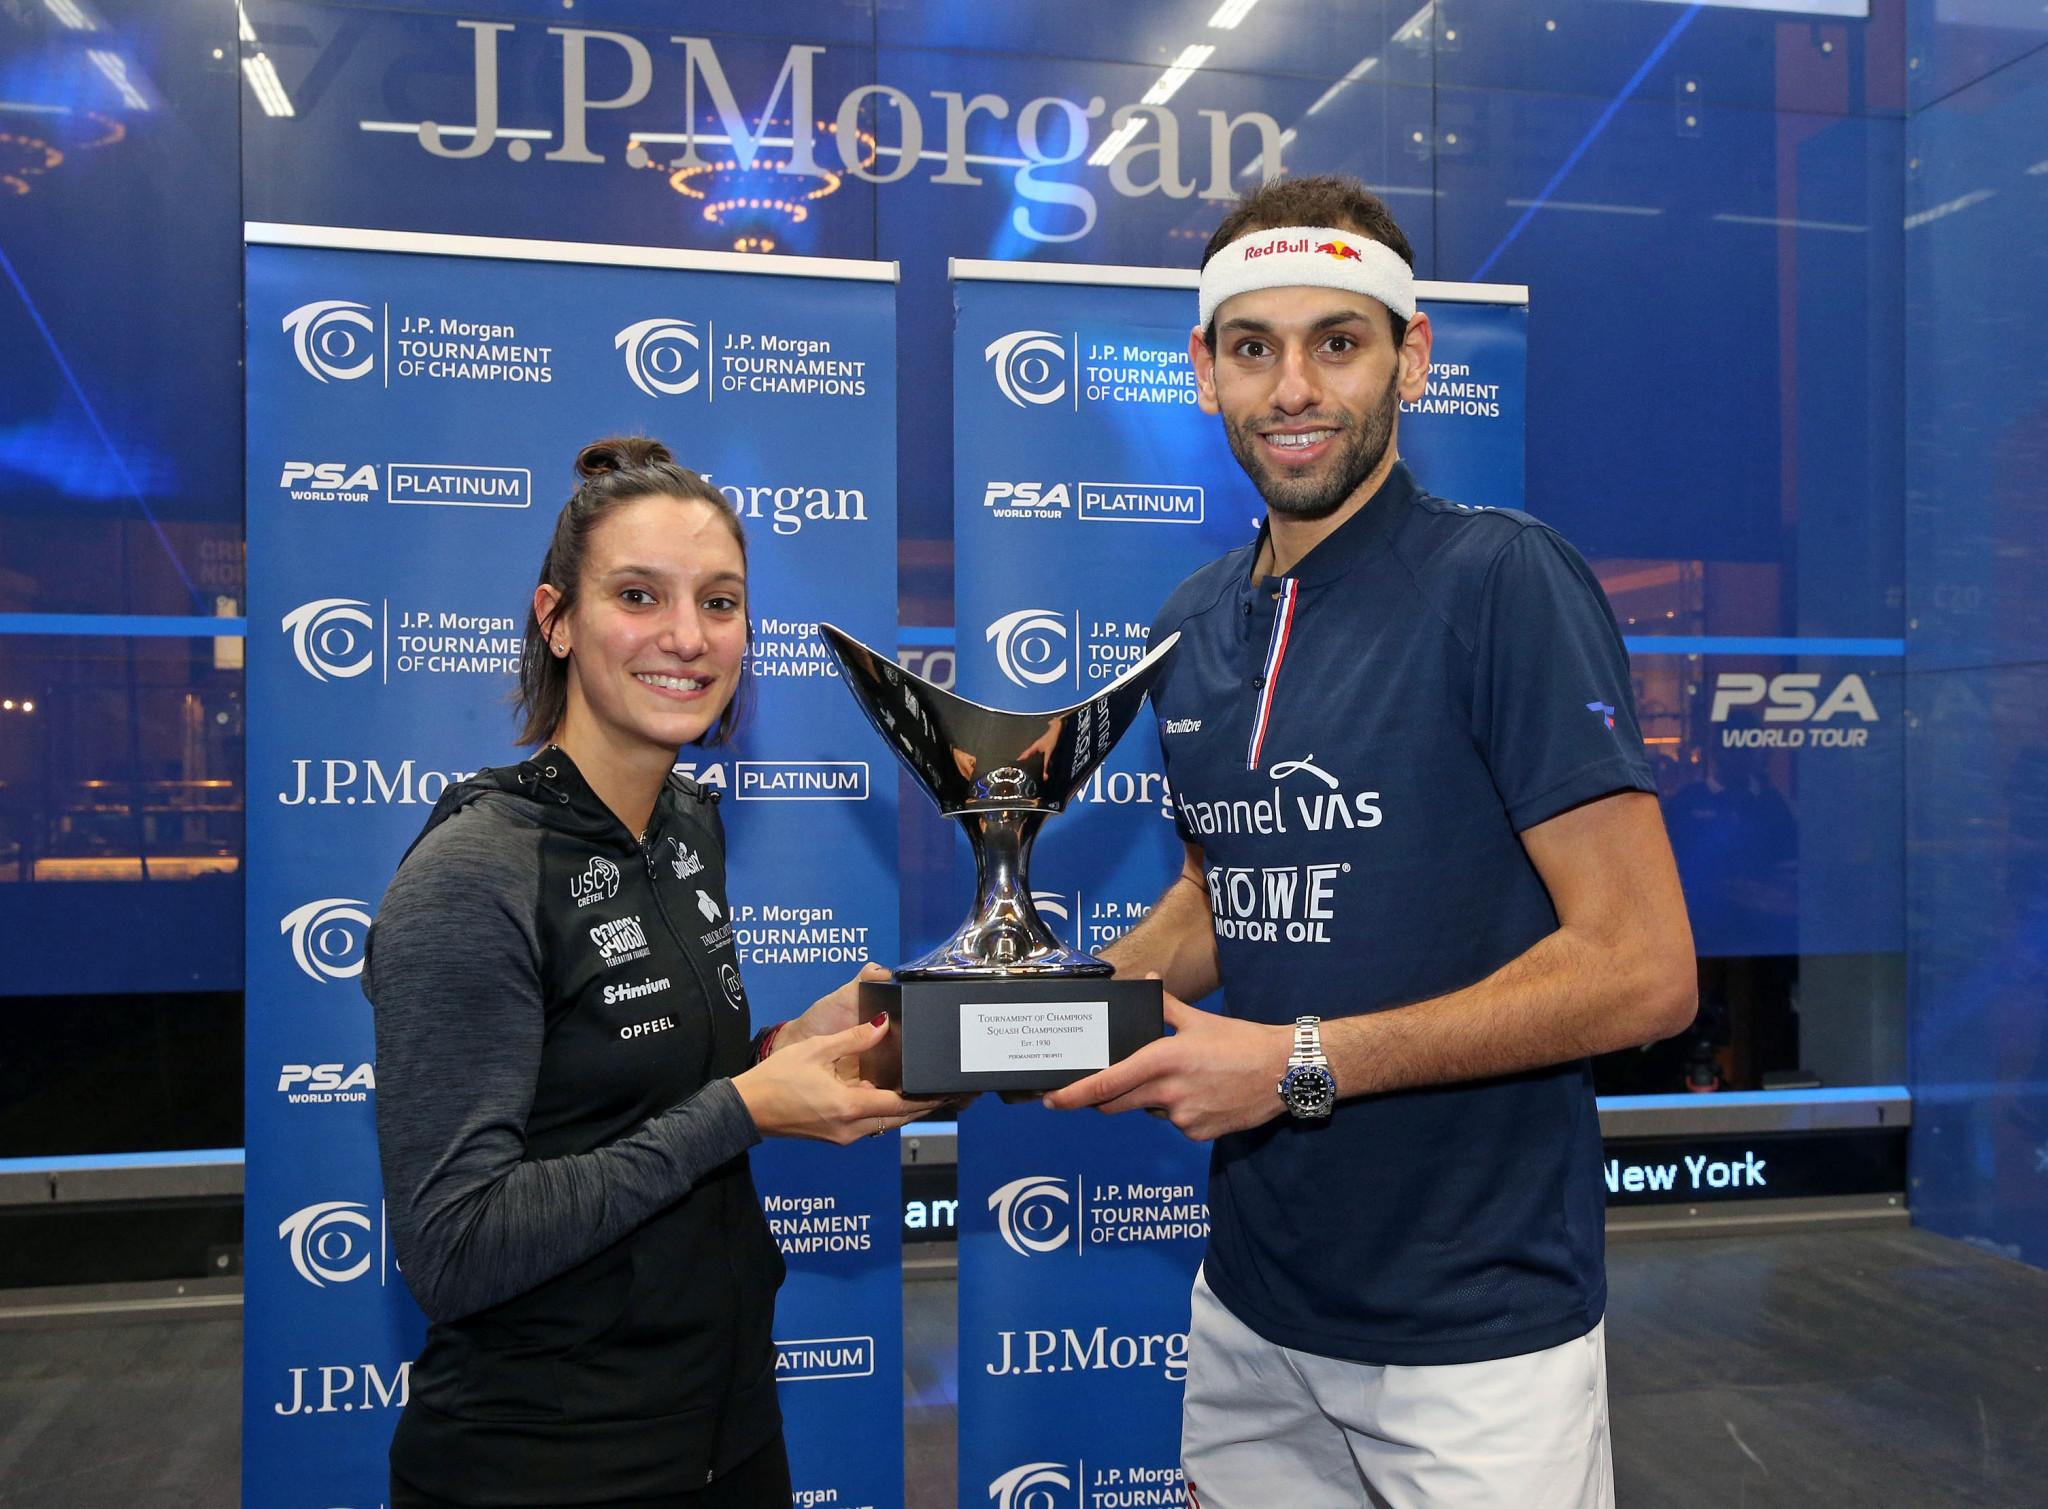 ElShorbagy and Serme capture PSA Tournament of Champions titles